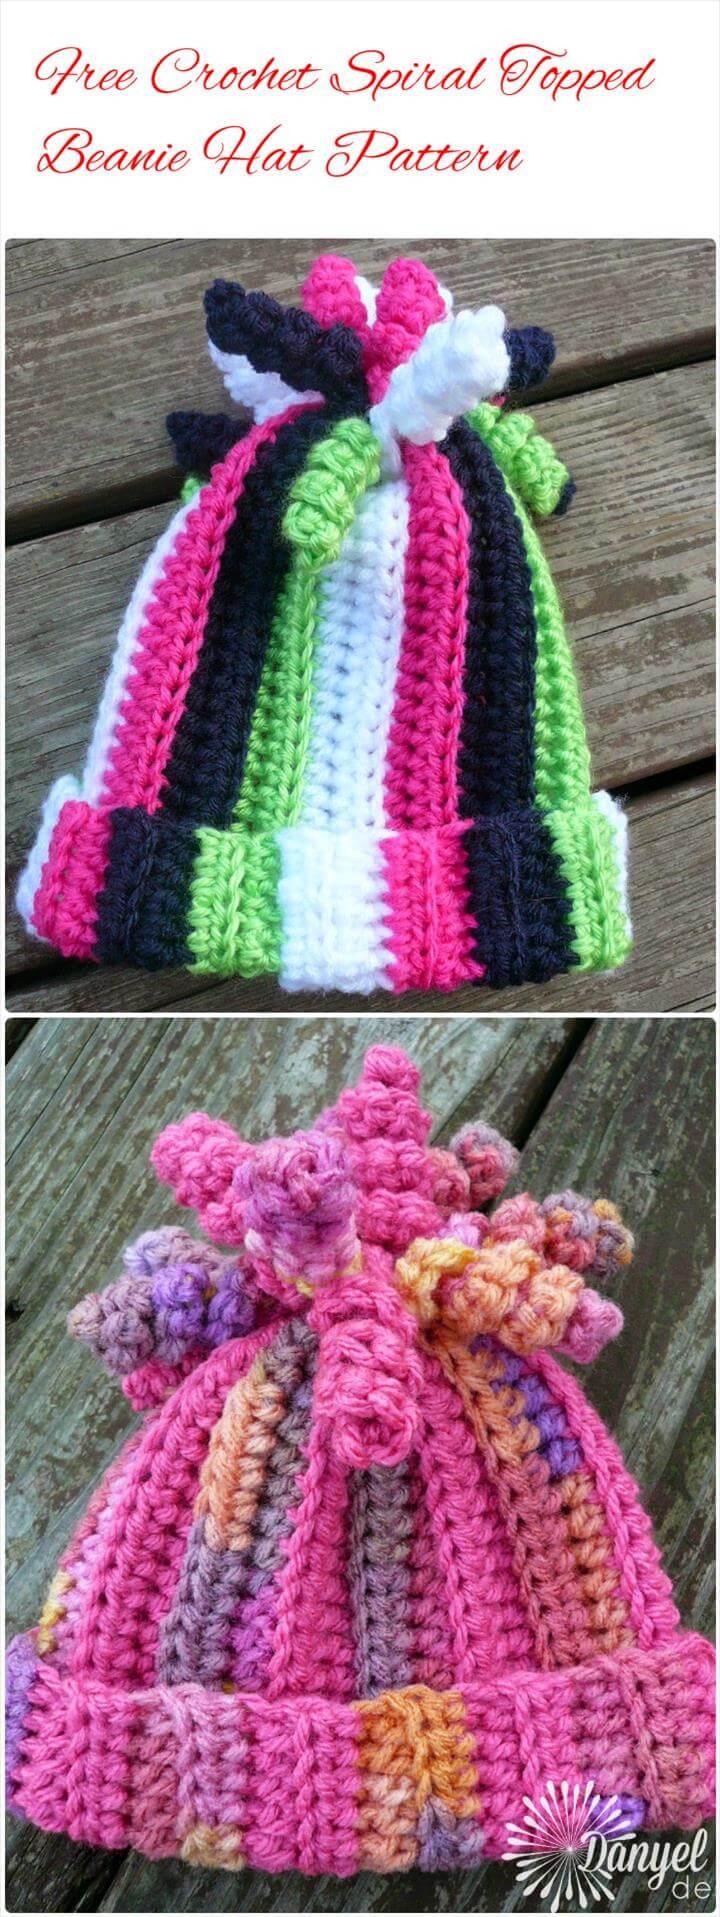 crochet spiral topped beanie hat